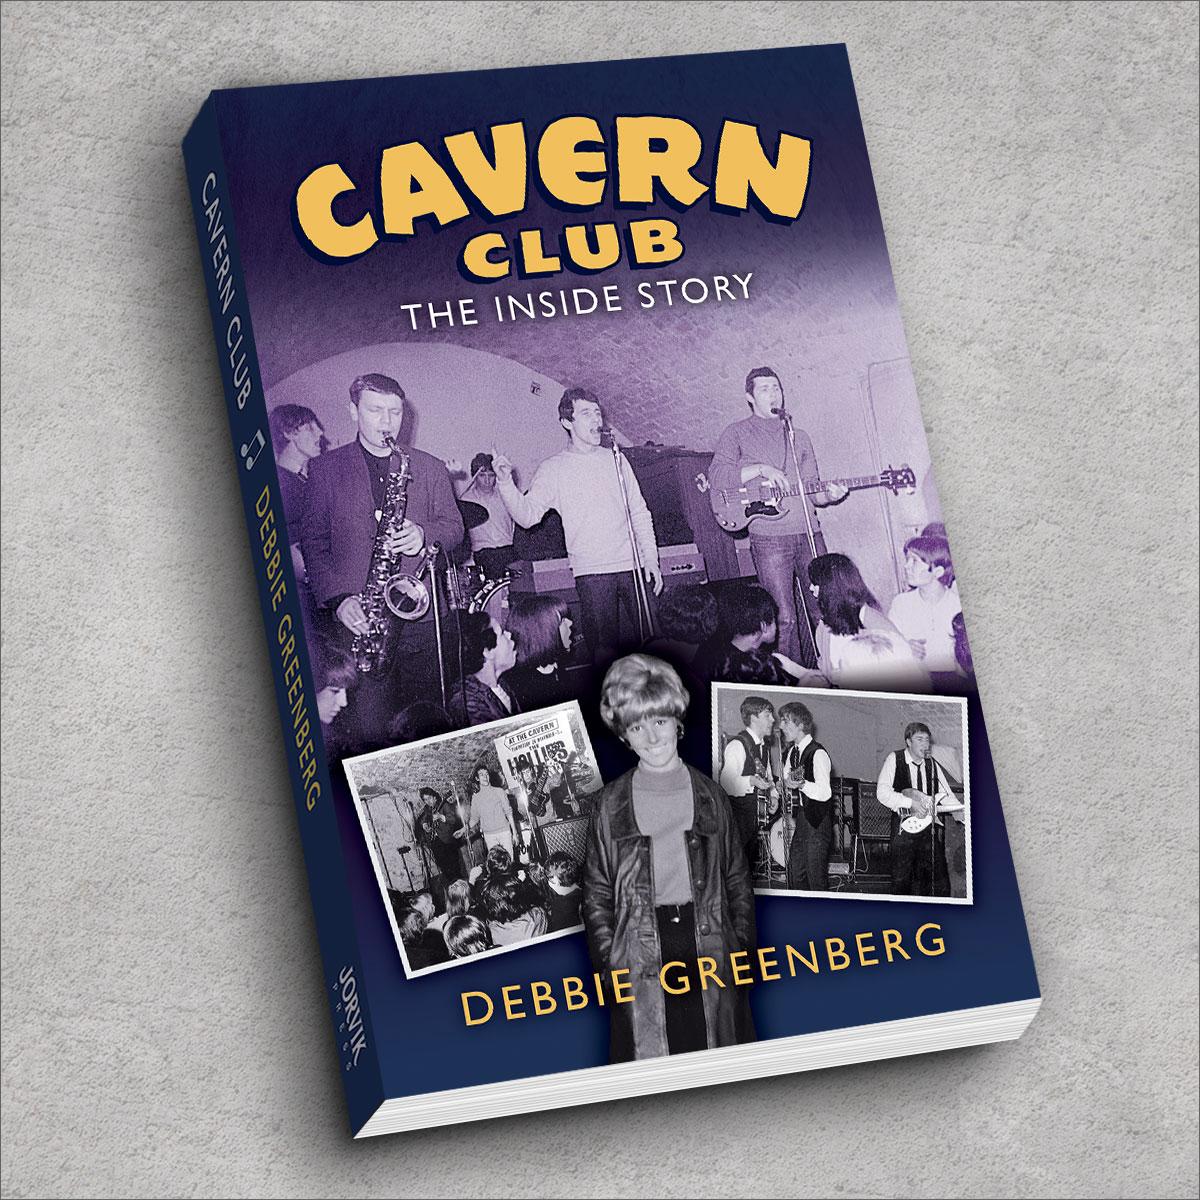 Cavern Club - The Inside Story